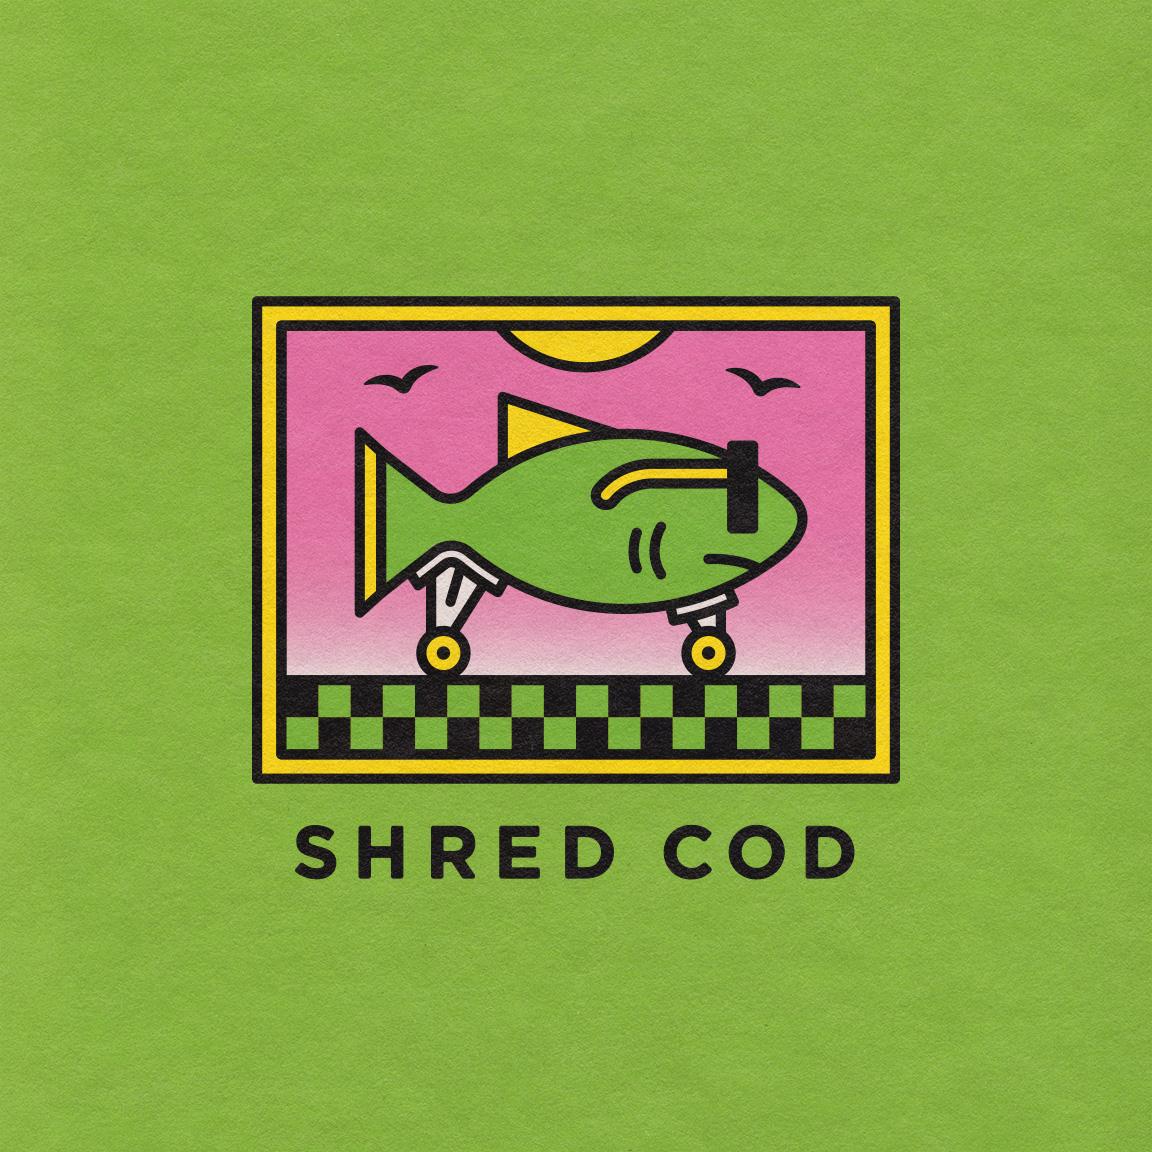 shredCod_export.jpg